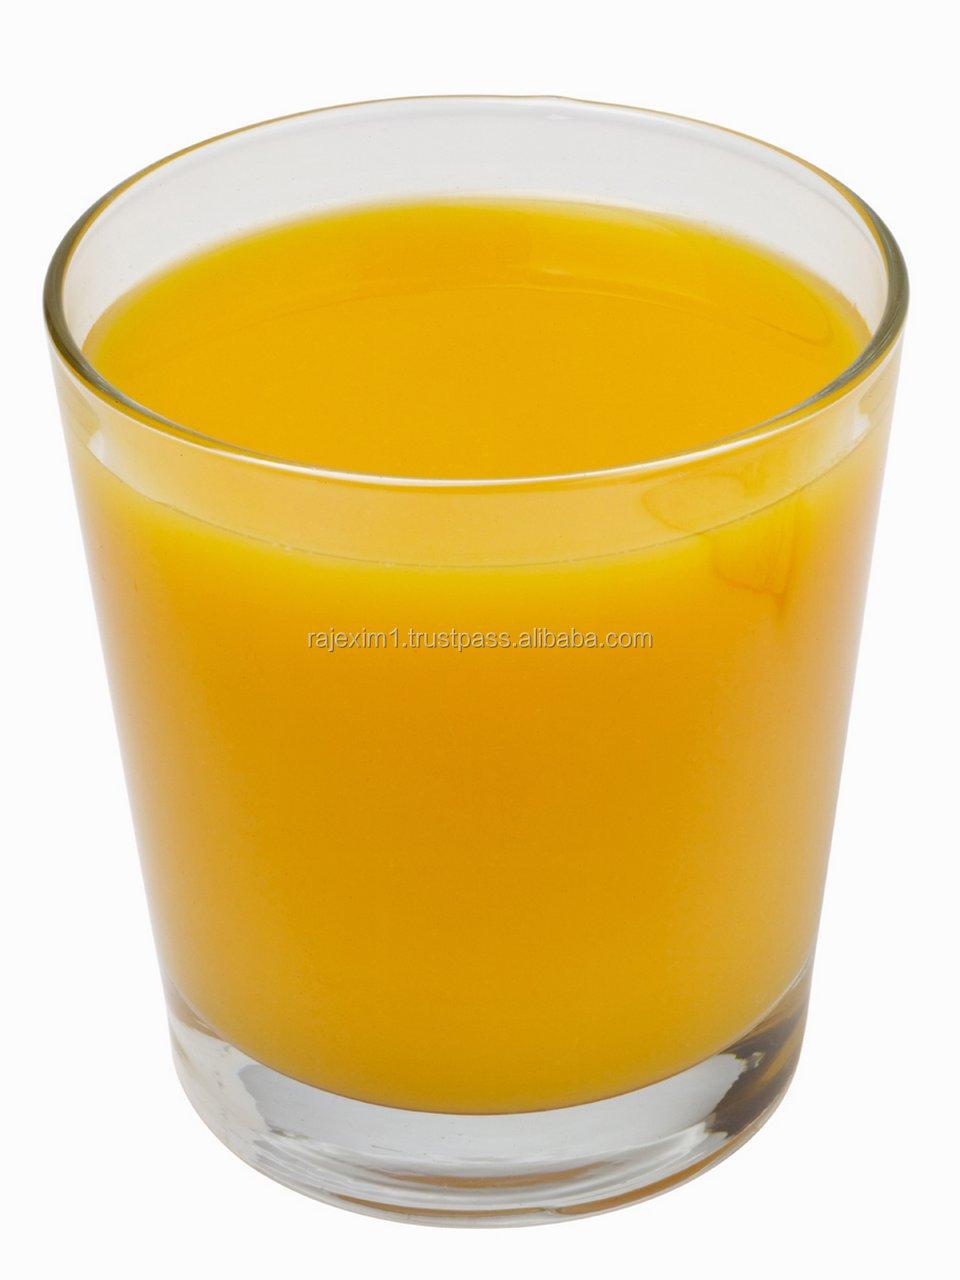 Where Can i Buy Mango Pulp